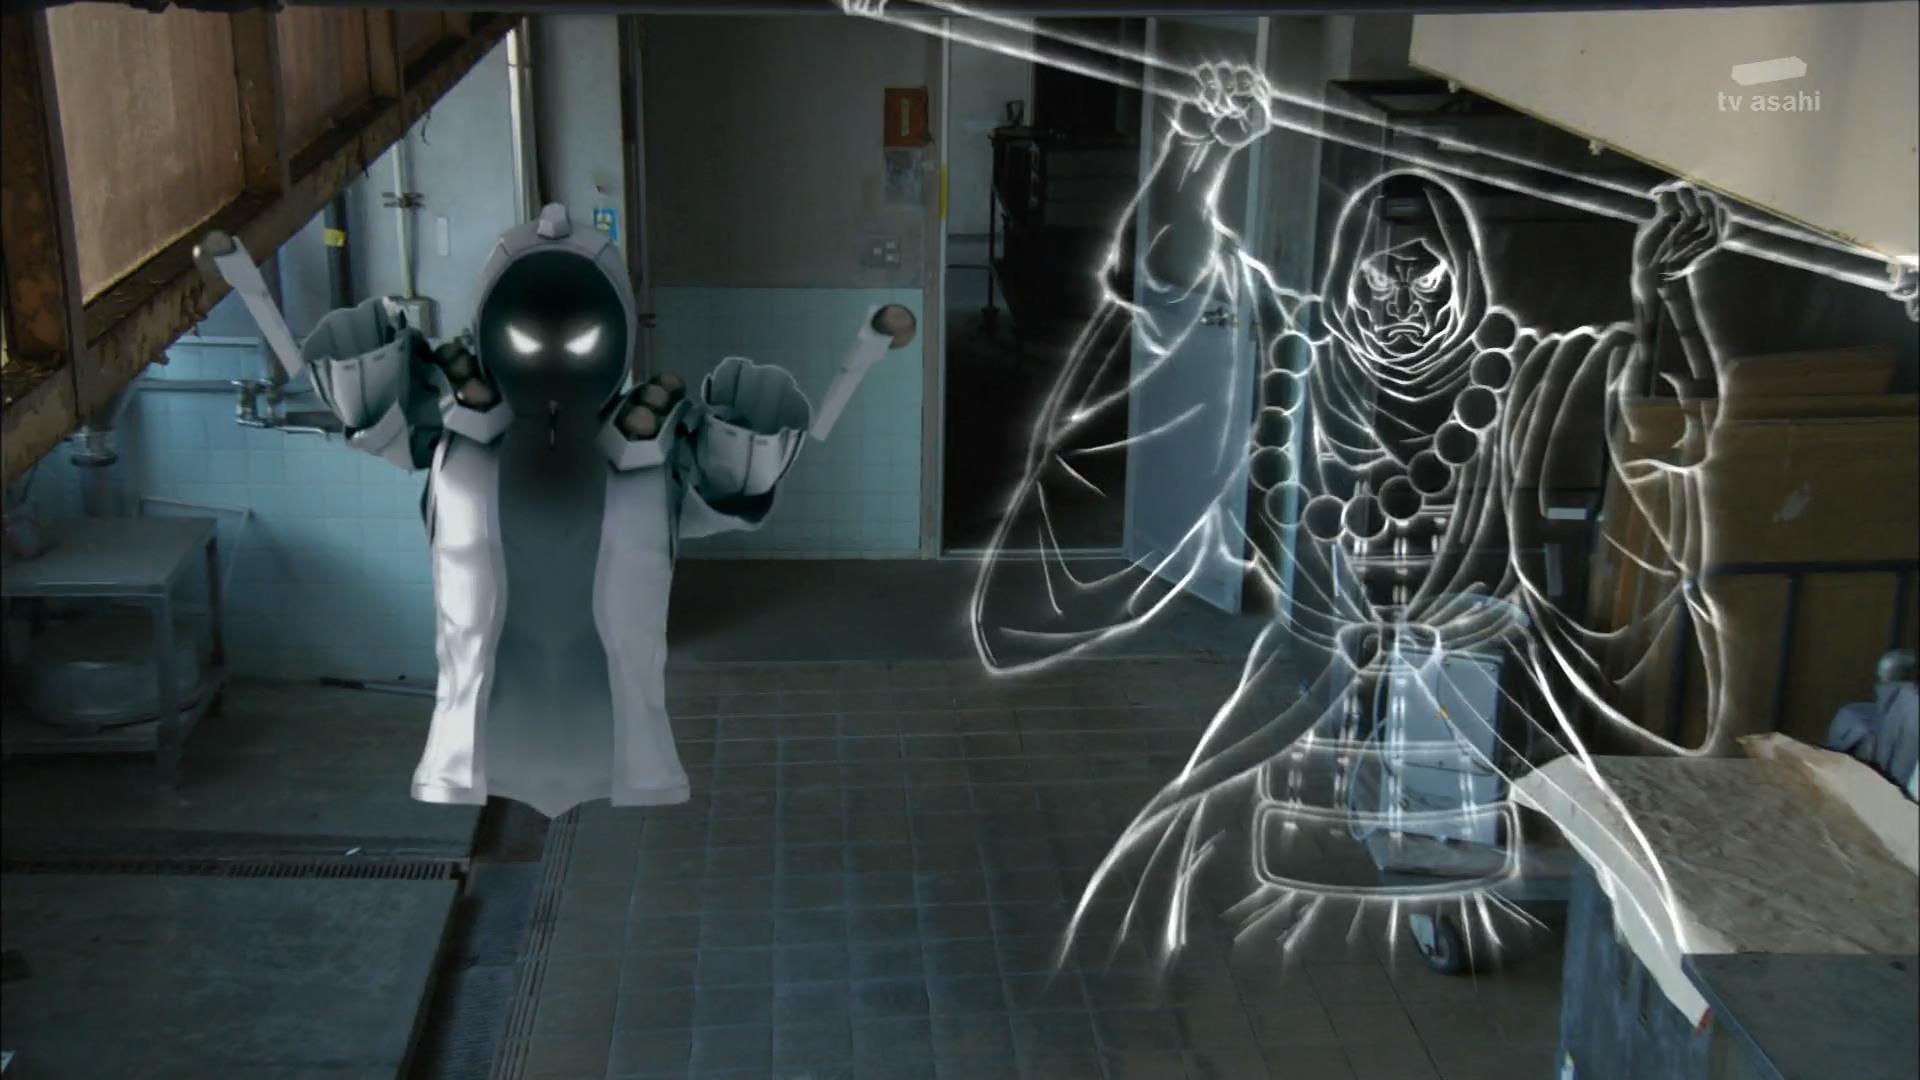 Toku Secrets Podcast: Episode 15 – Kamen Rider Ghost Episode 09 Review